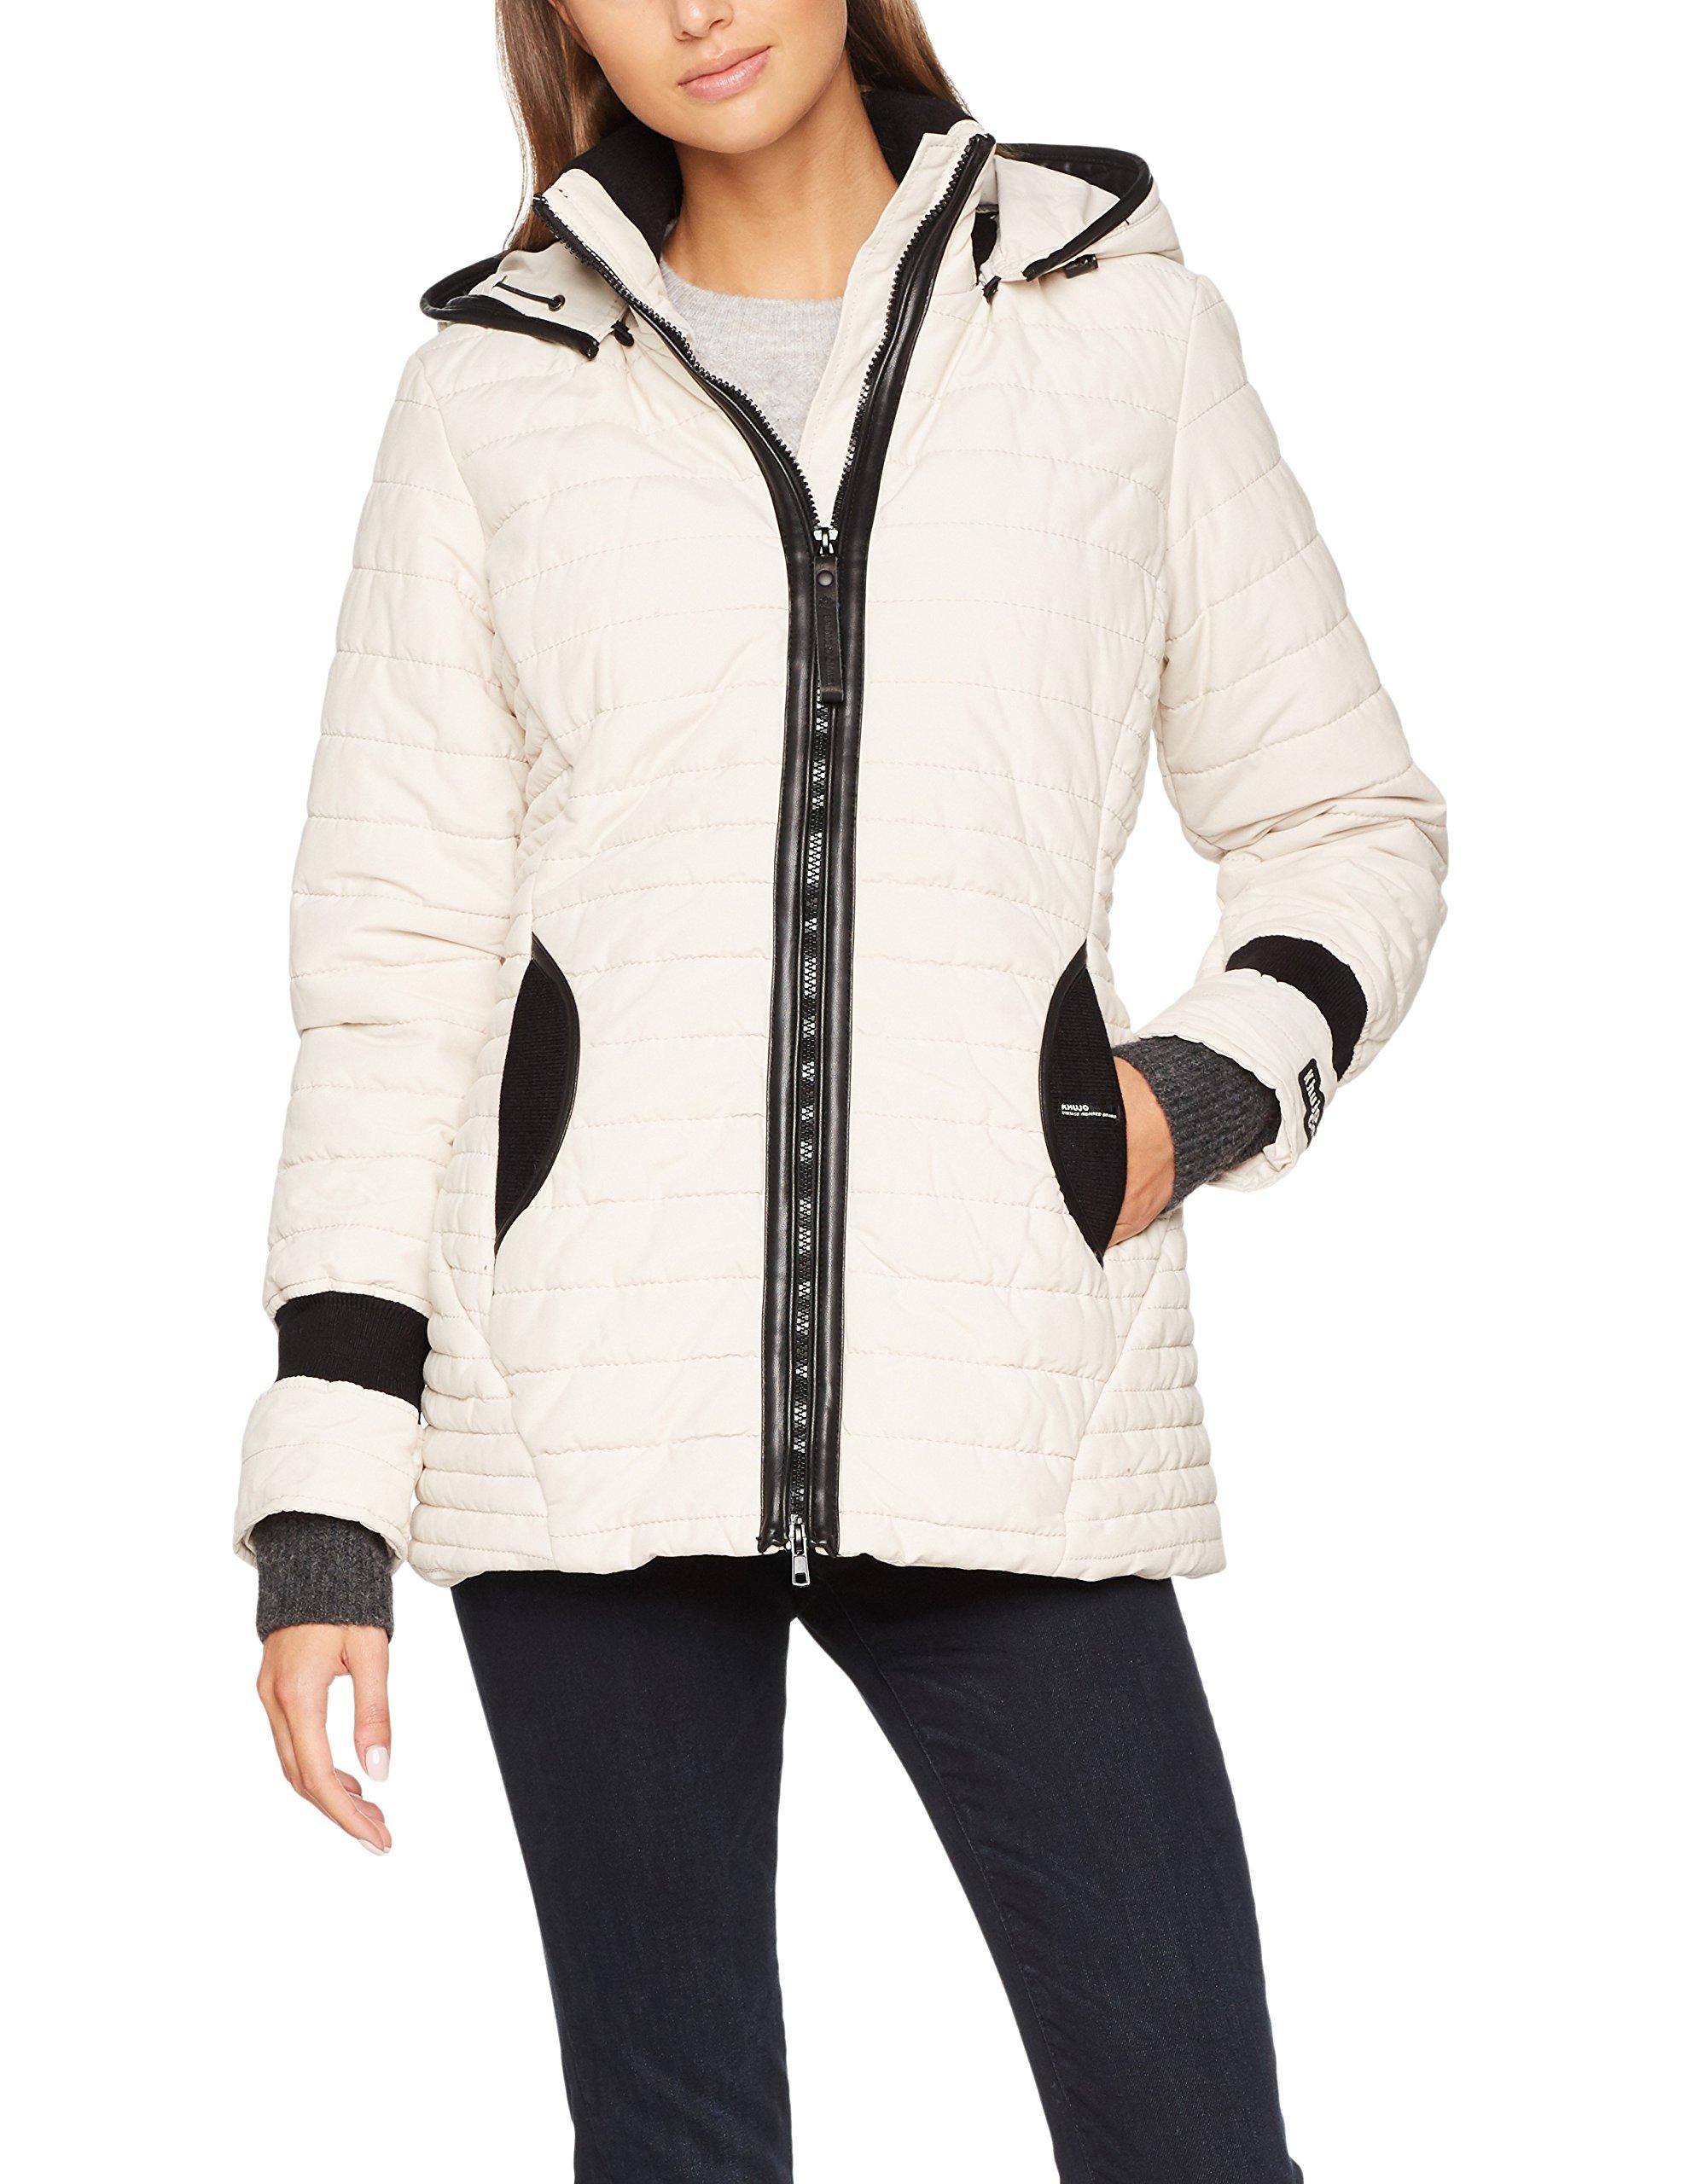 119M Retro Jacket BlousonBeigemoonbea Midd Femme Khujo qSUGVpMz